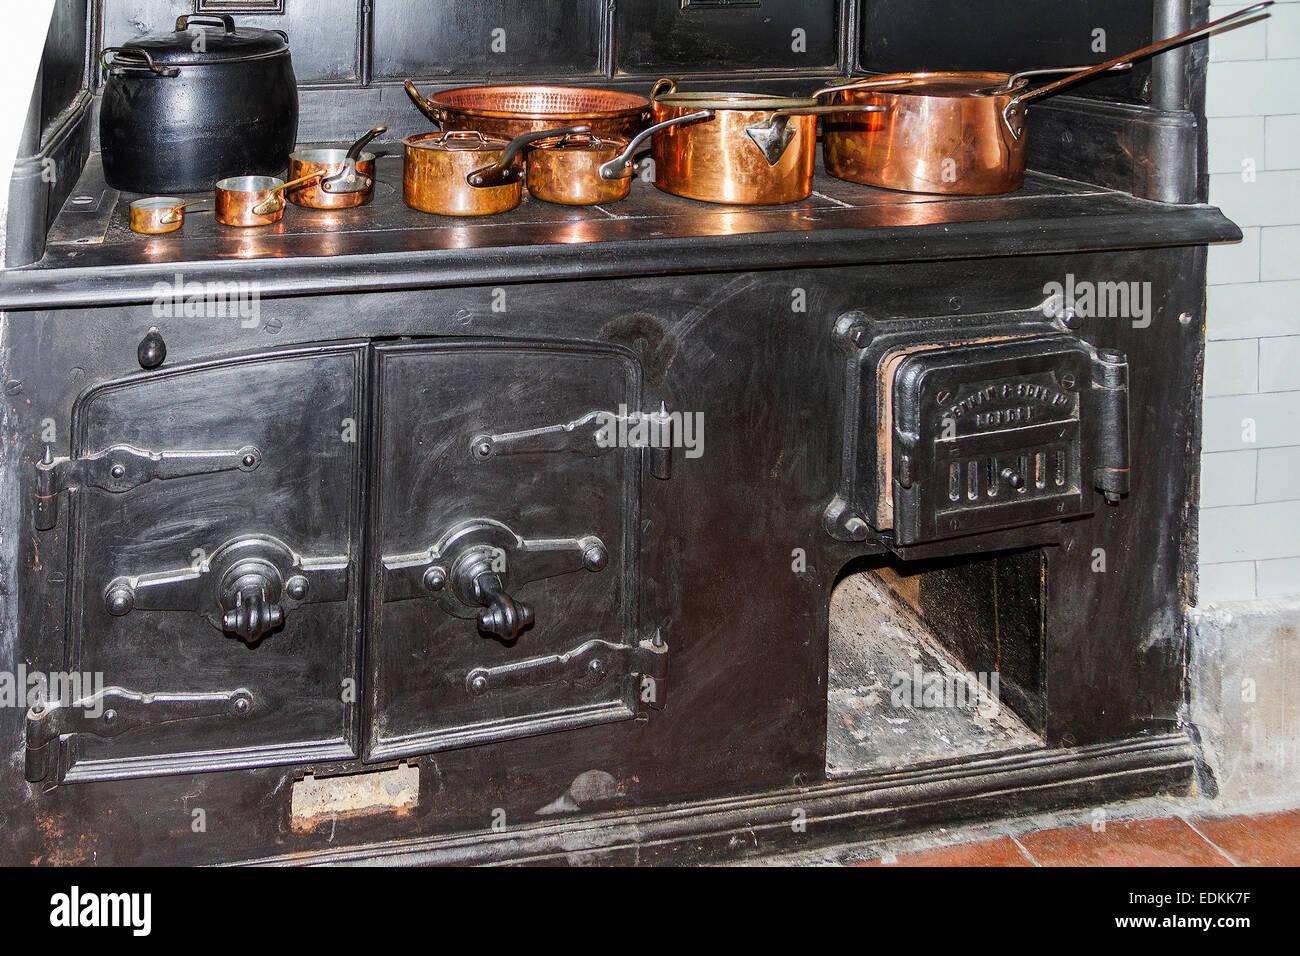 Victorian Cooking Range Stock Photo 77264195 Alamy